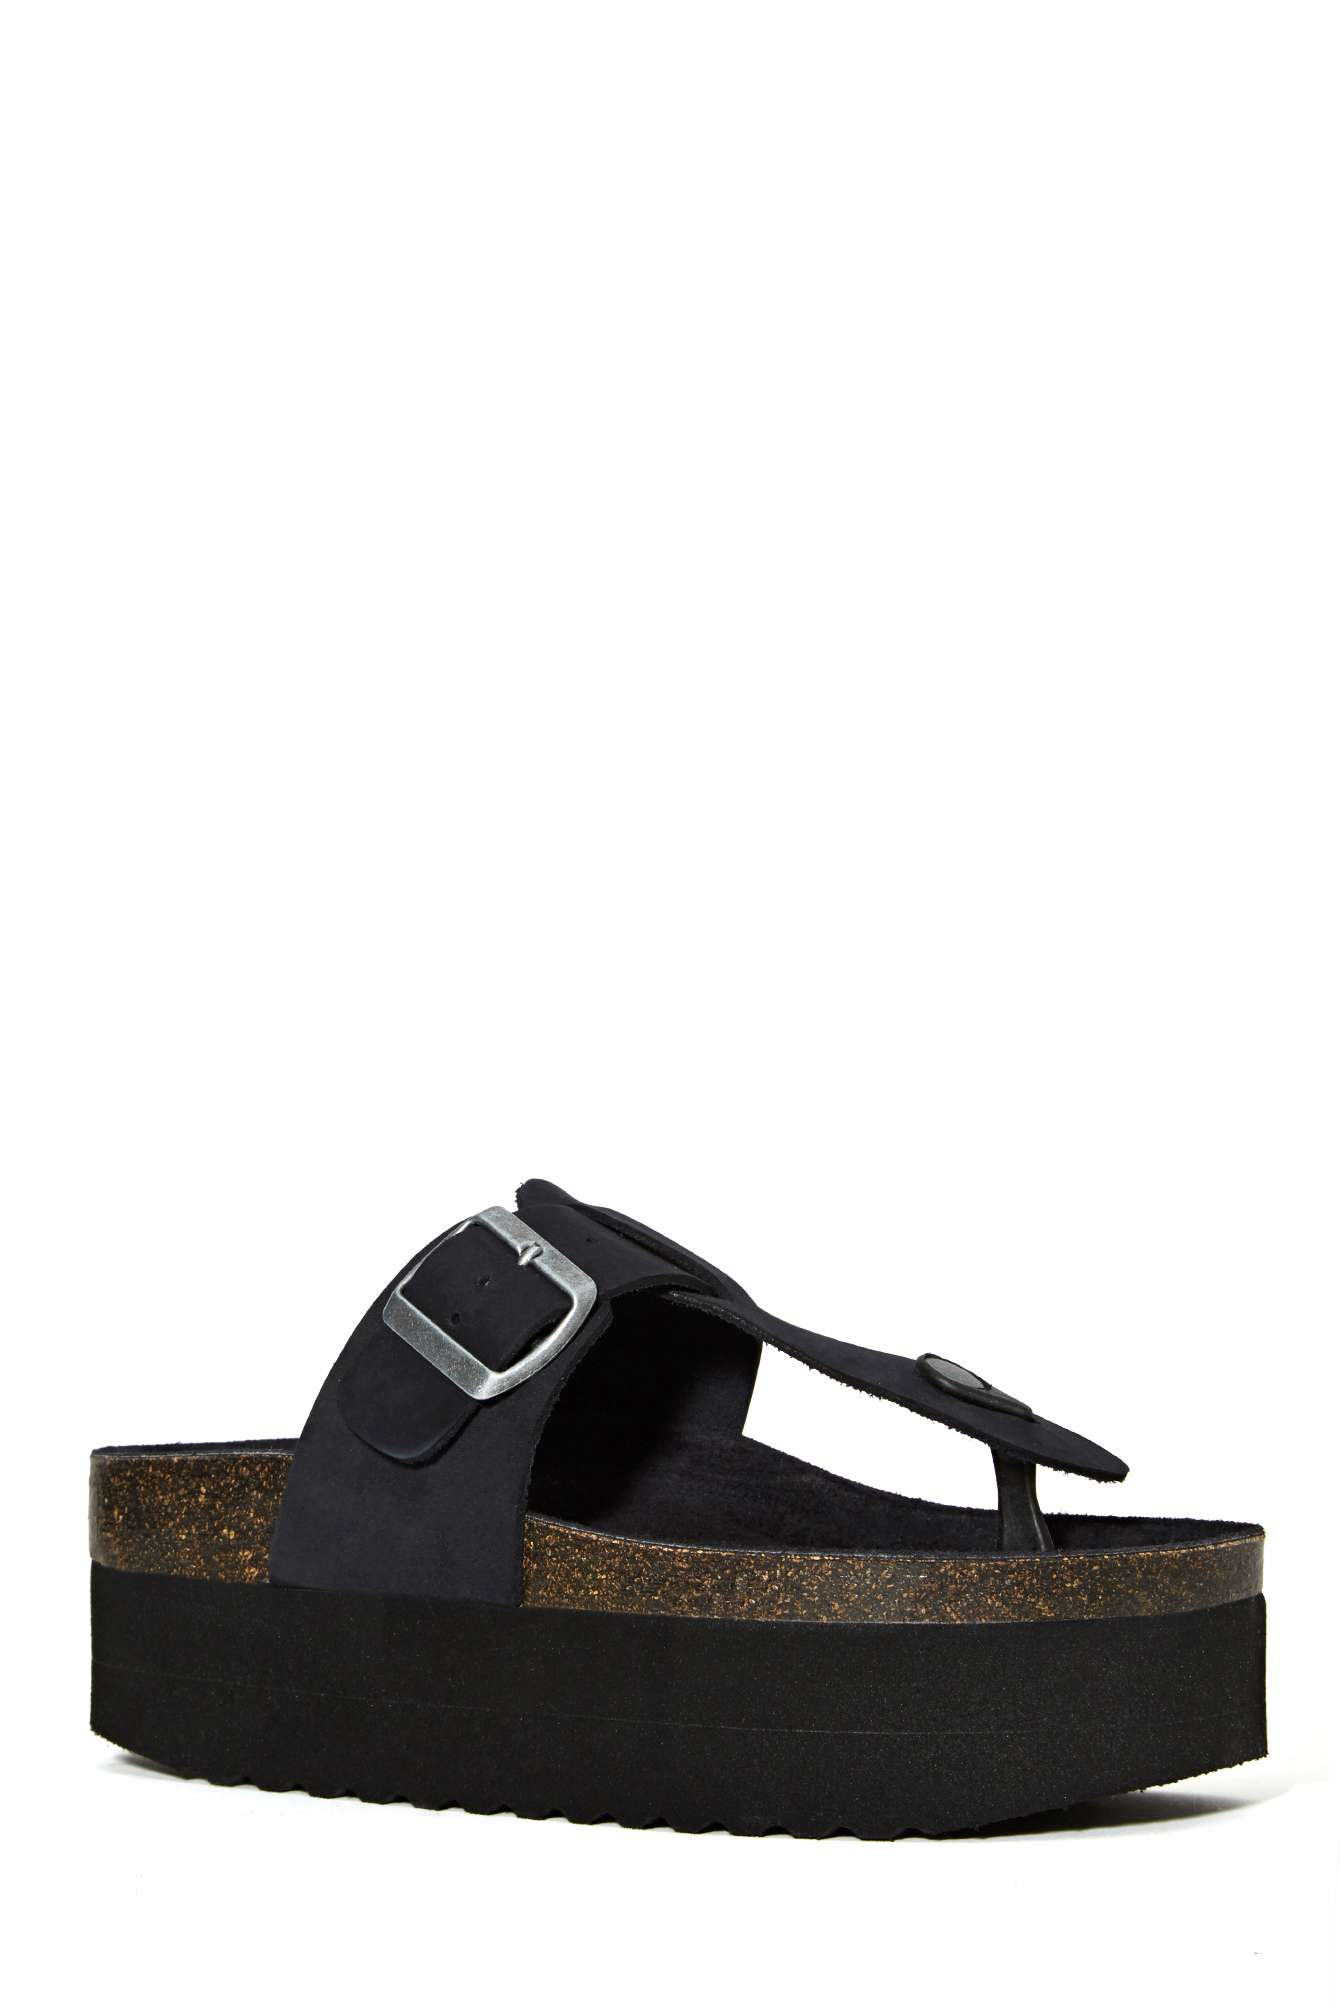 Nasty Gal Jeffrey Campbell Vesuvius Platform Sandal In